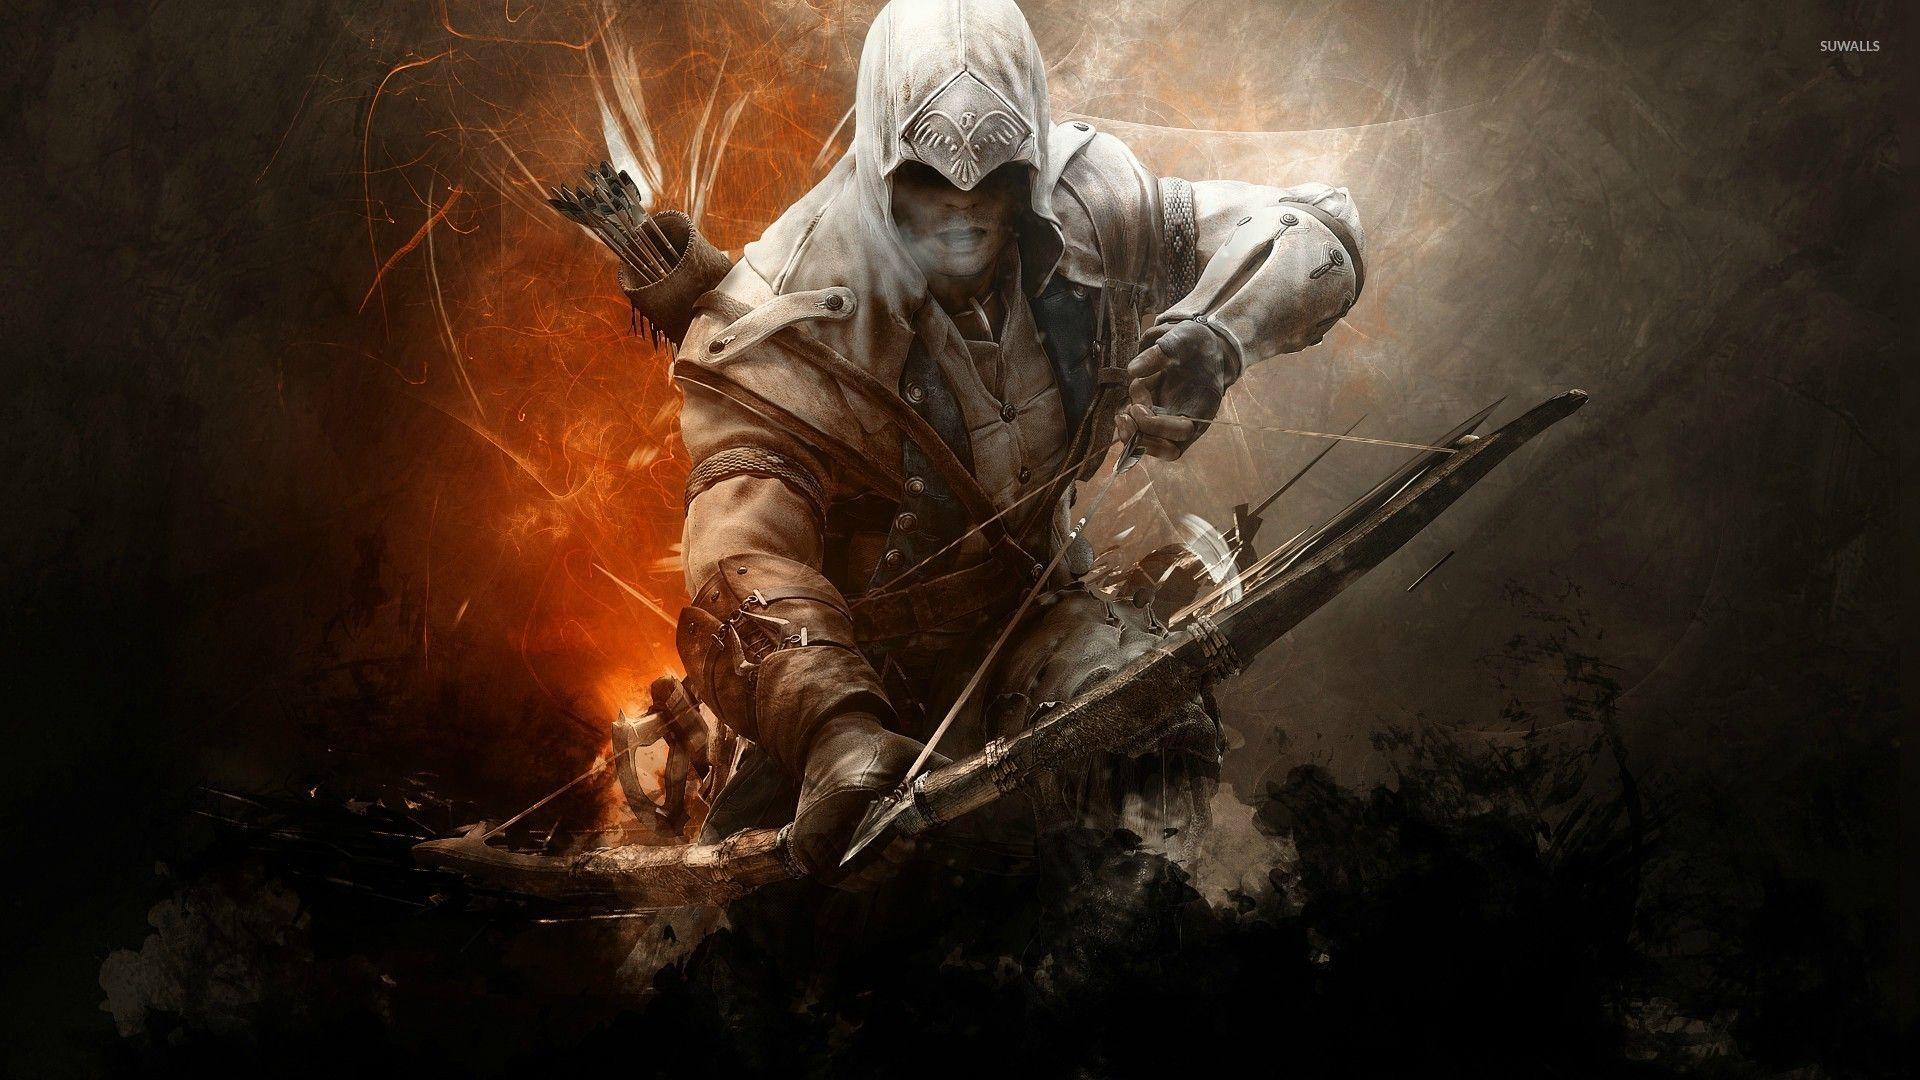 Assassin S Creed Iii Wallpaper Hd X